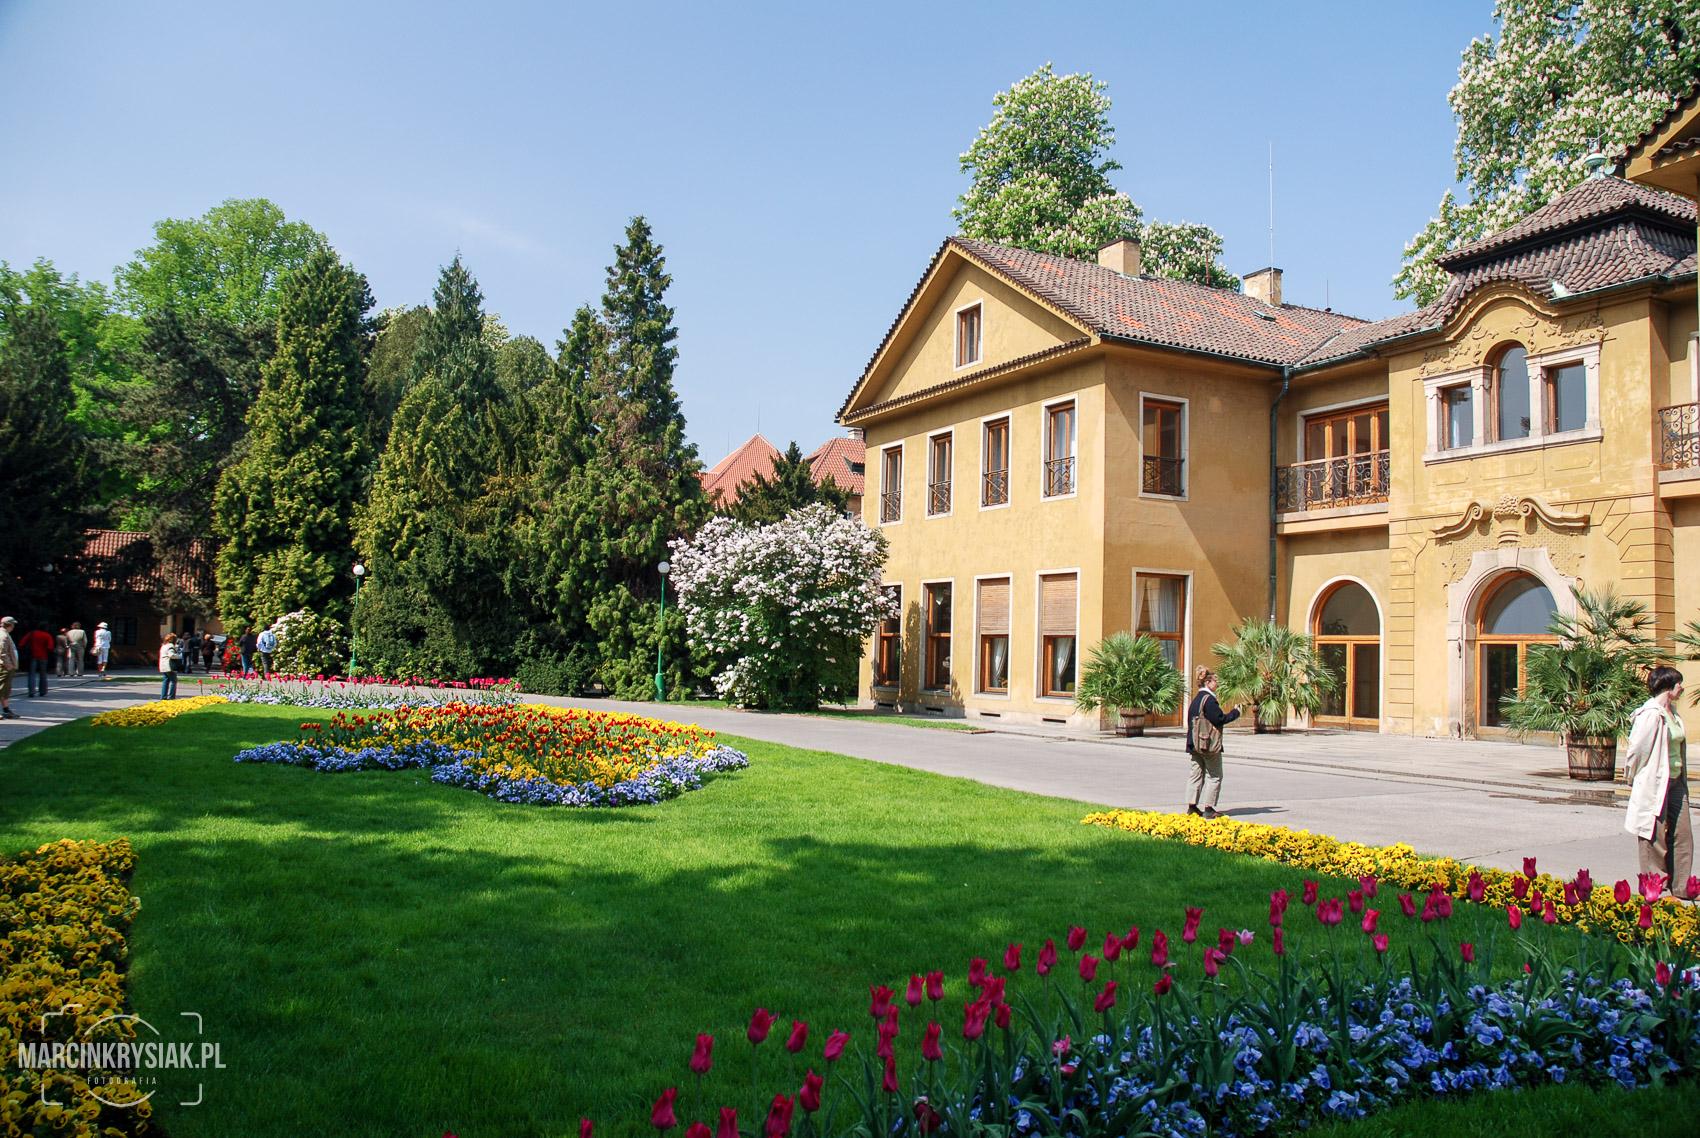 ogród, miasto, stolica, Praga, Czechy